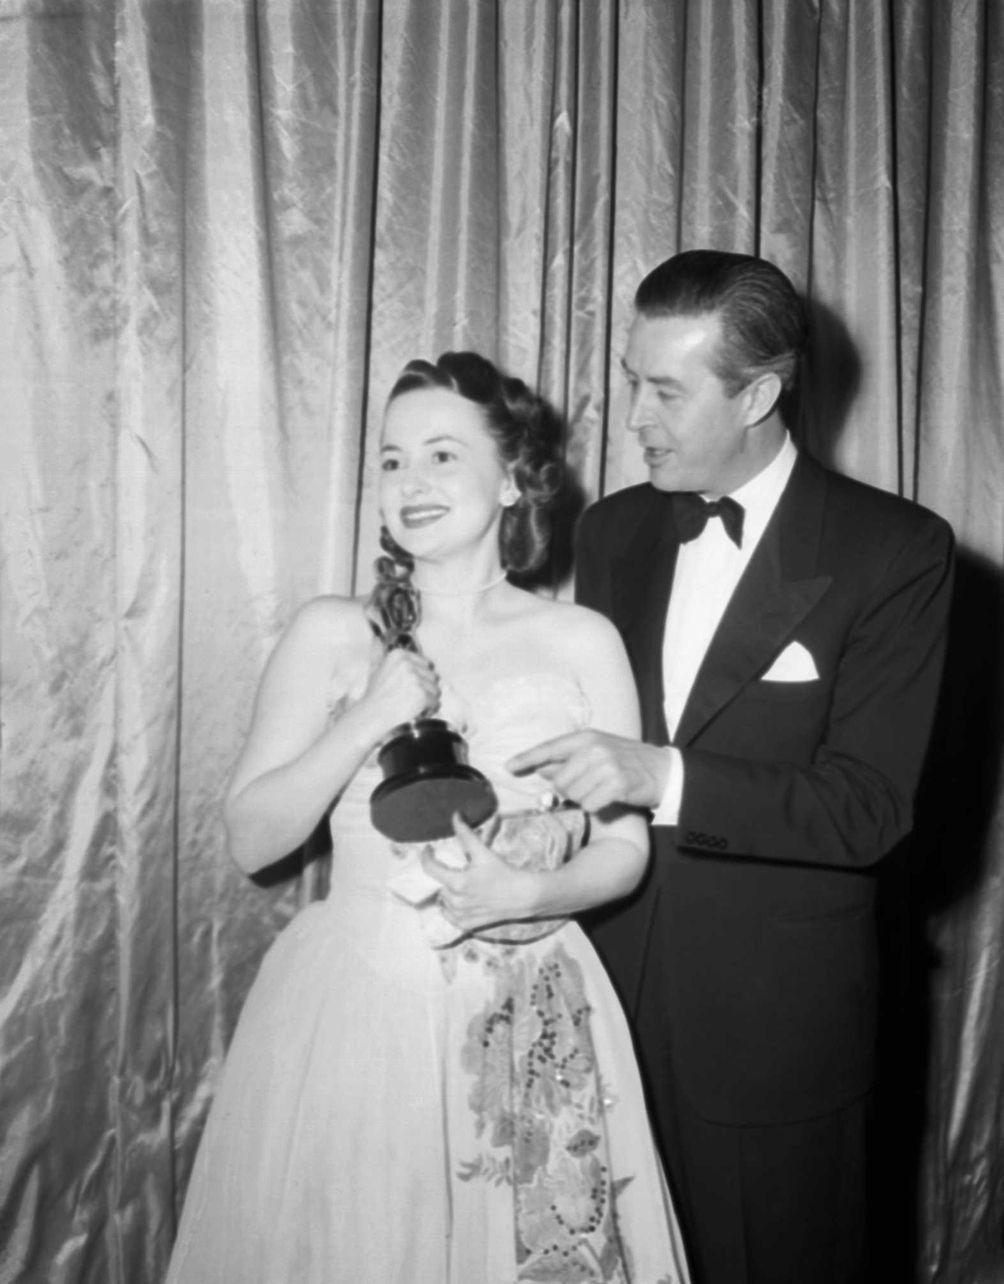 1946 - Olivia De Havilland - To Each